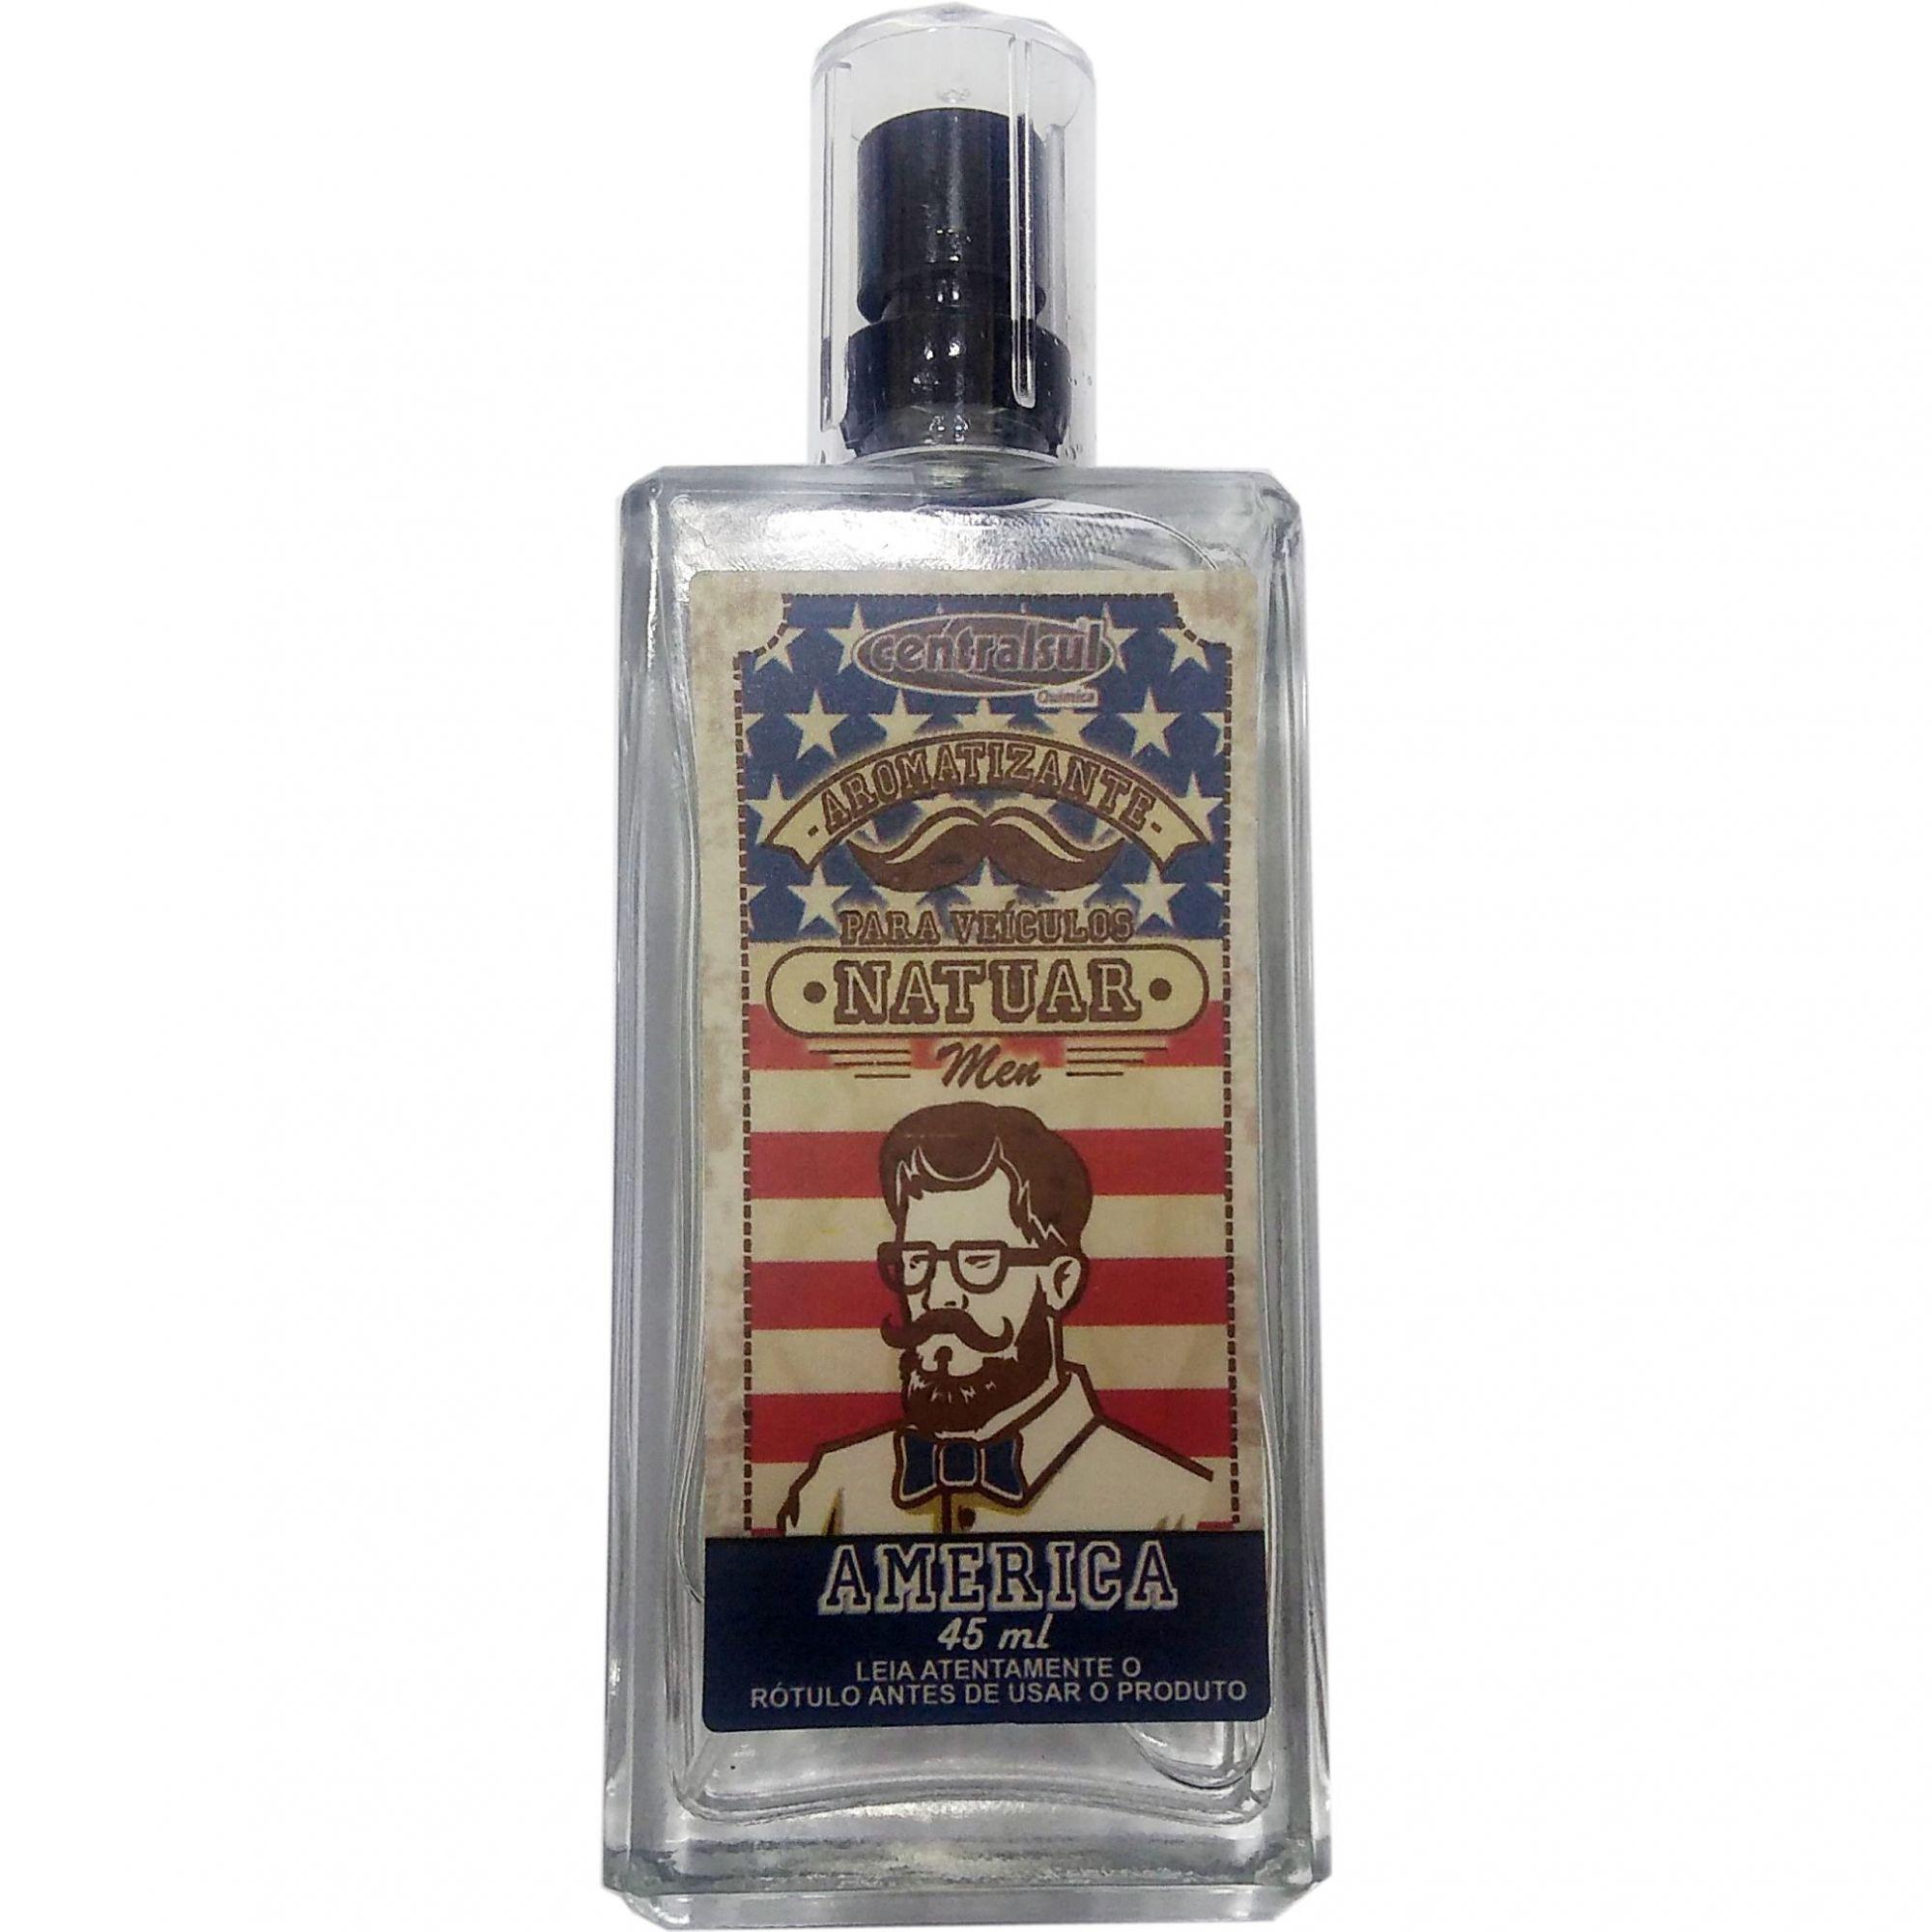 Aromatizante Natuar Men America 45ml Centralsul  - Loja Go Eco Wash